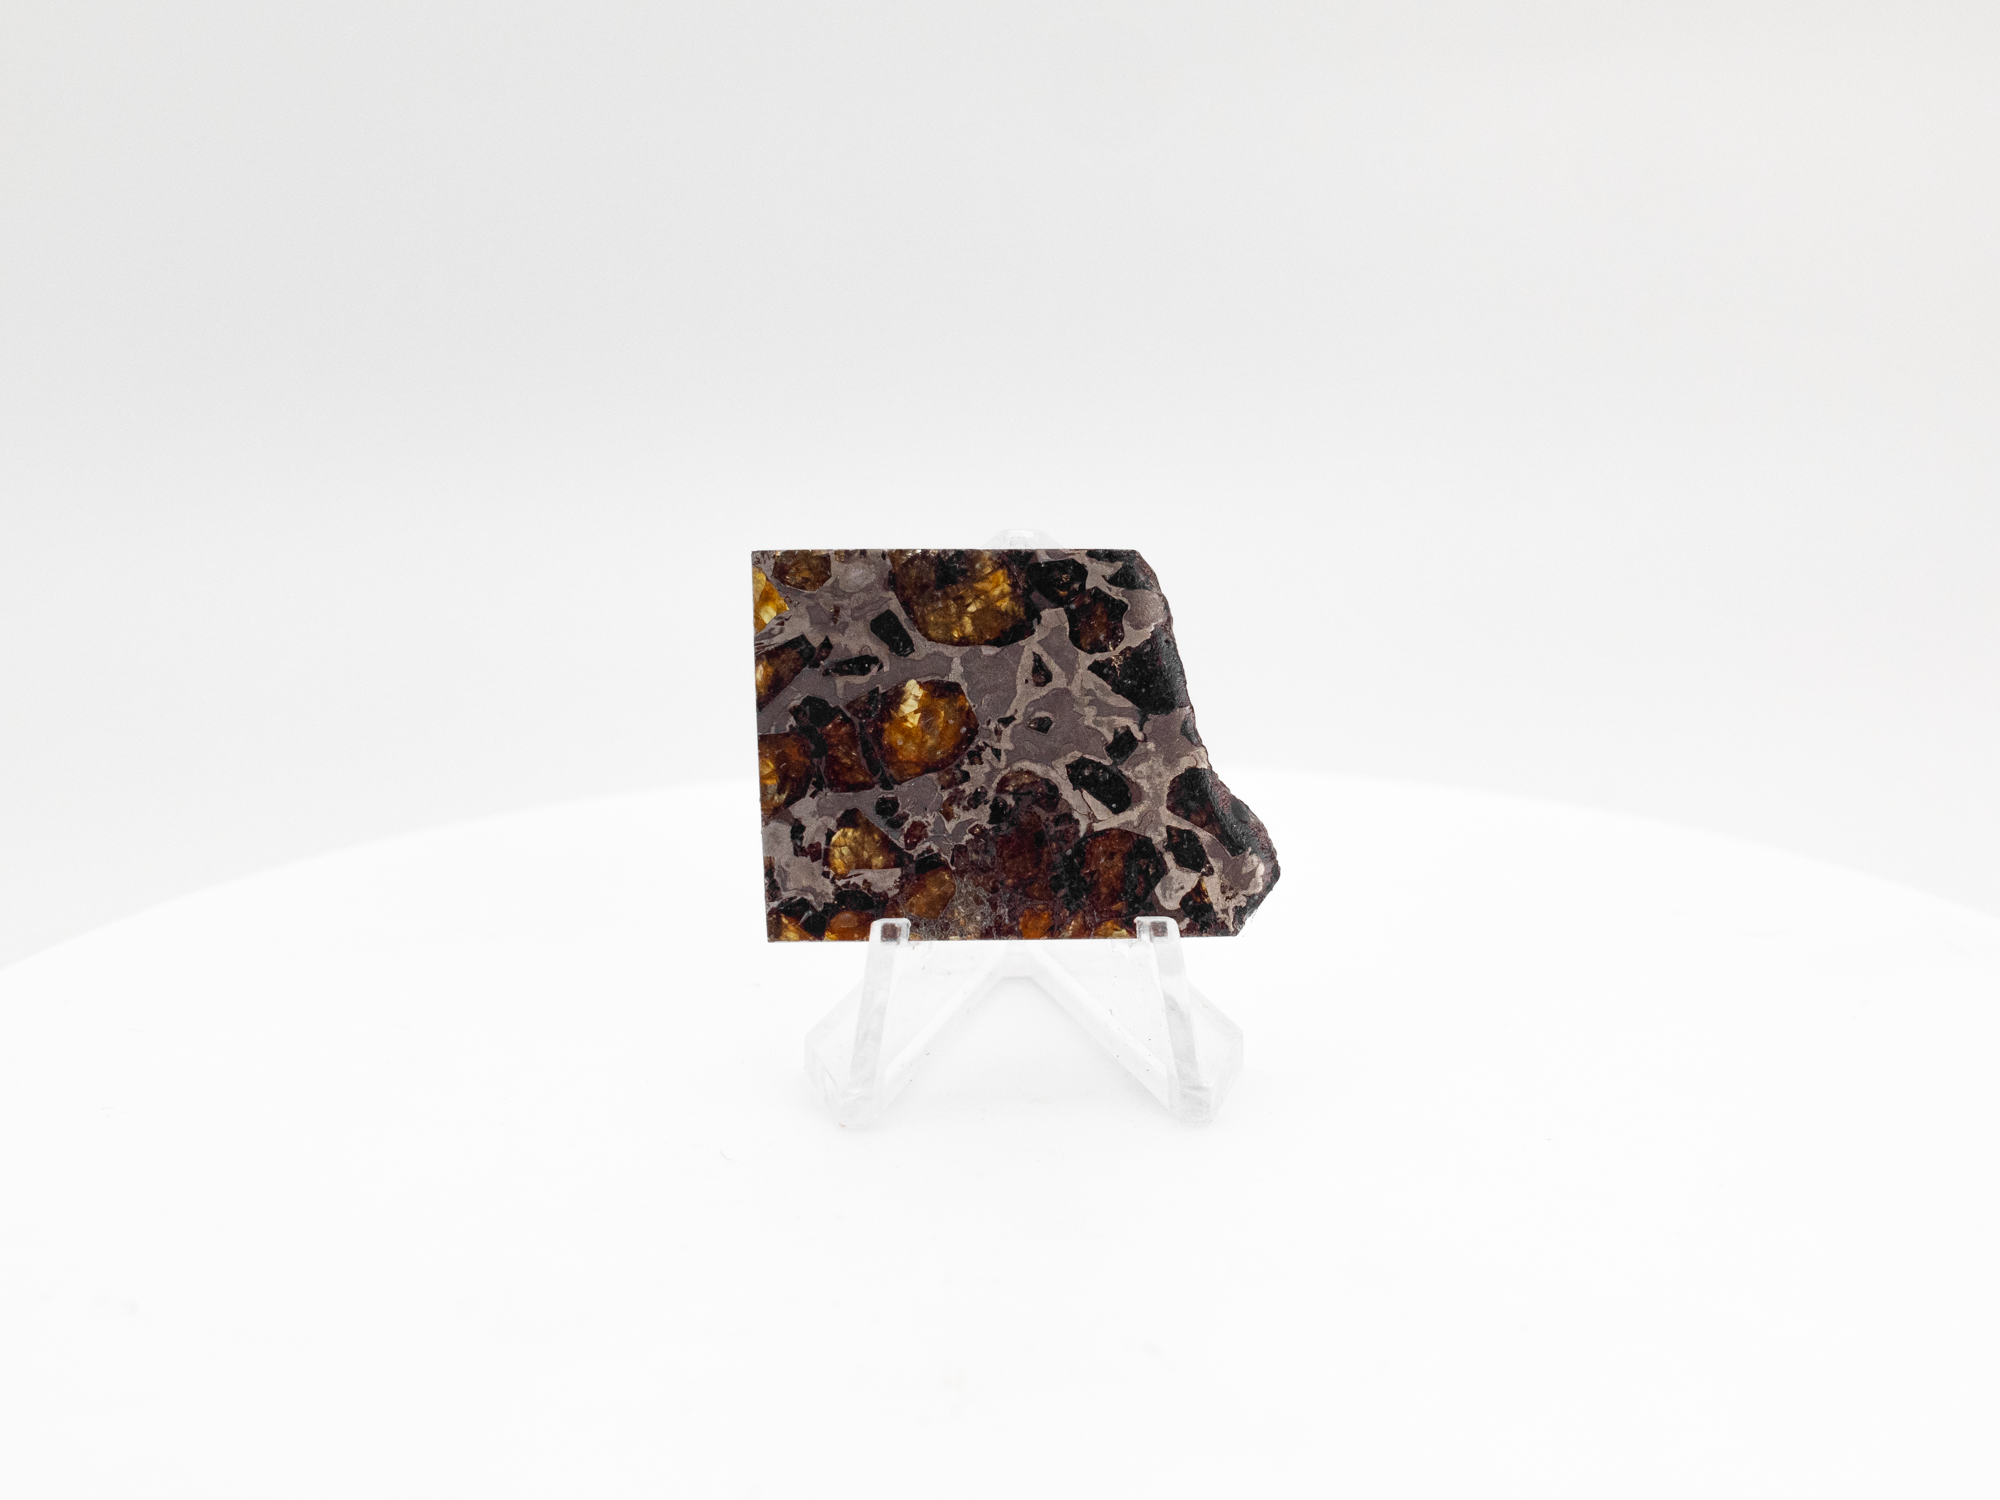 brahin pallasite meteorite 12 grams